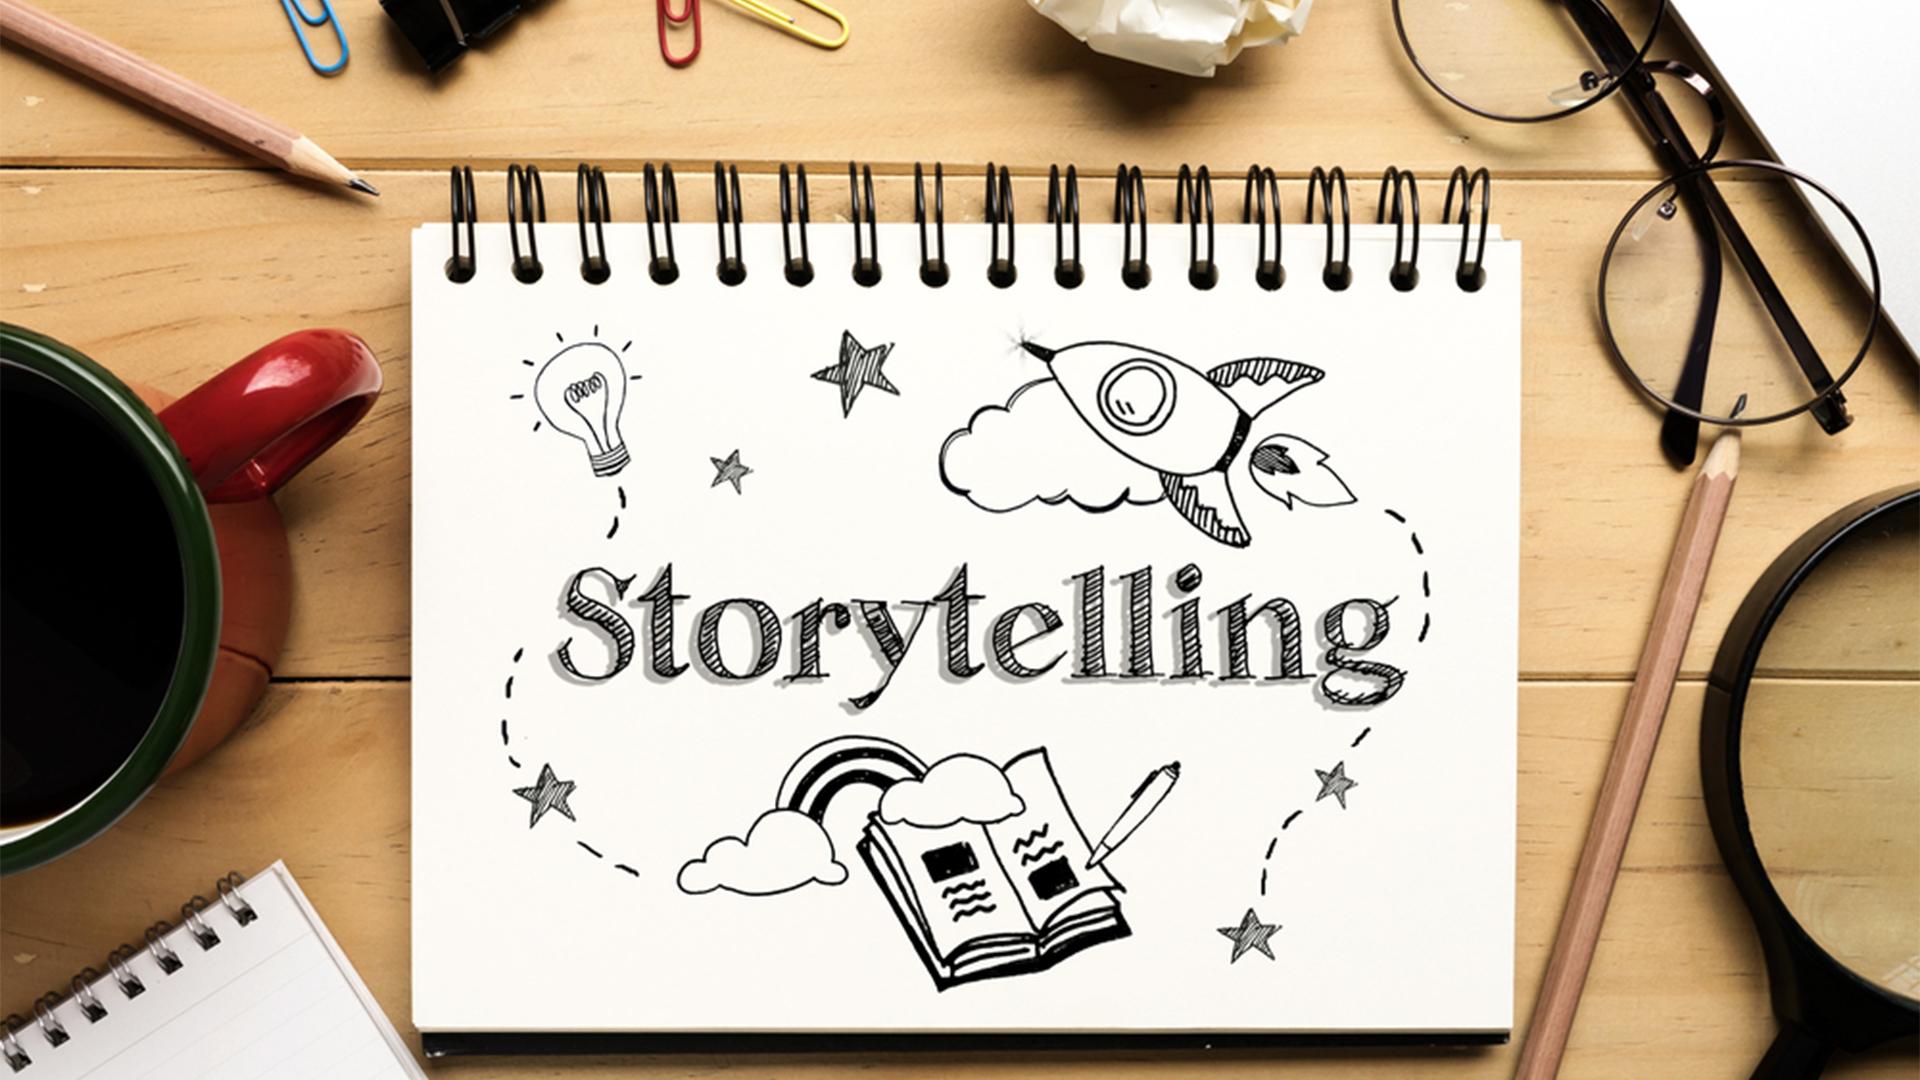 Senta que lá vem Storytelling